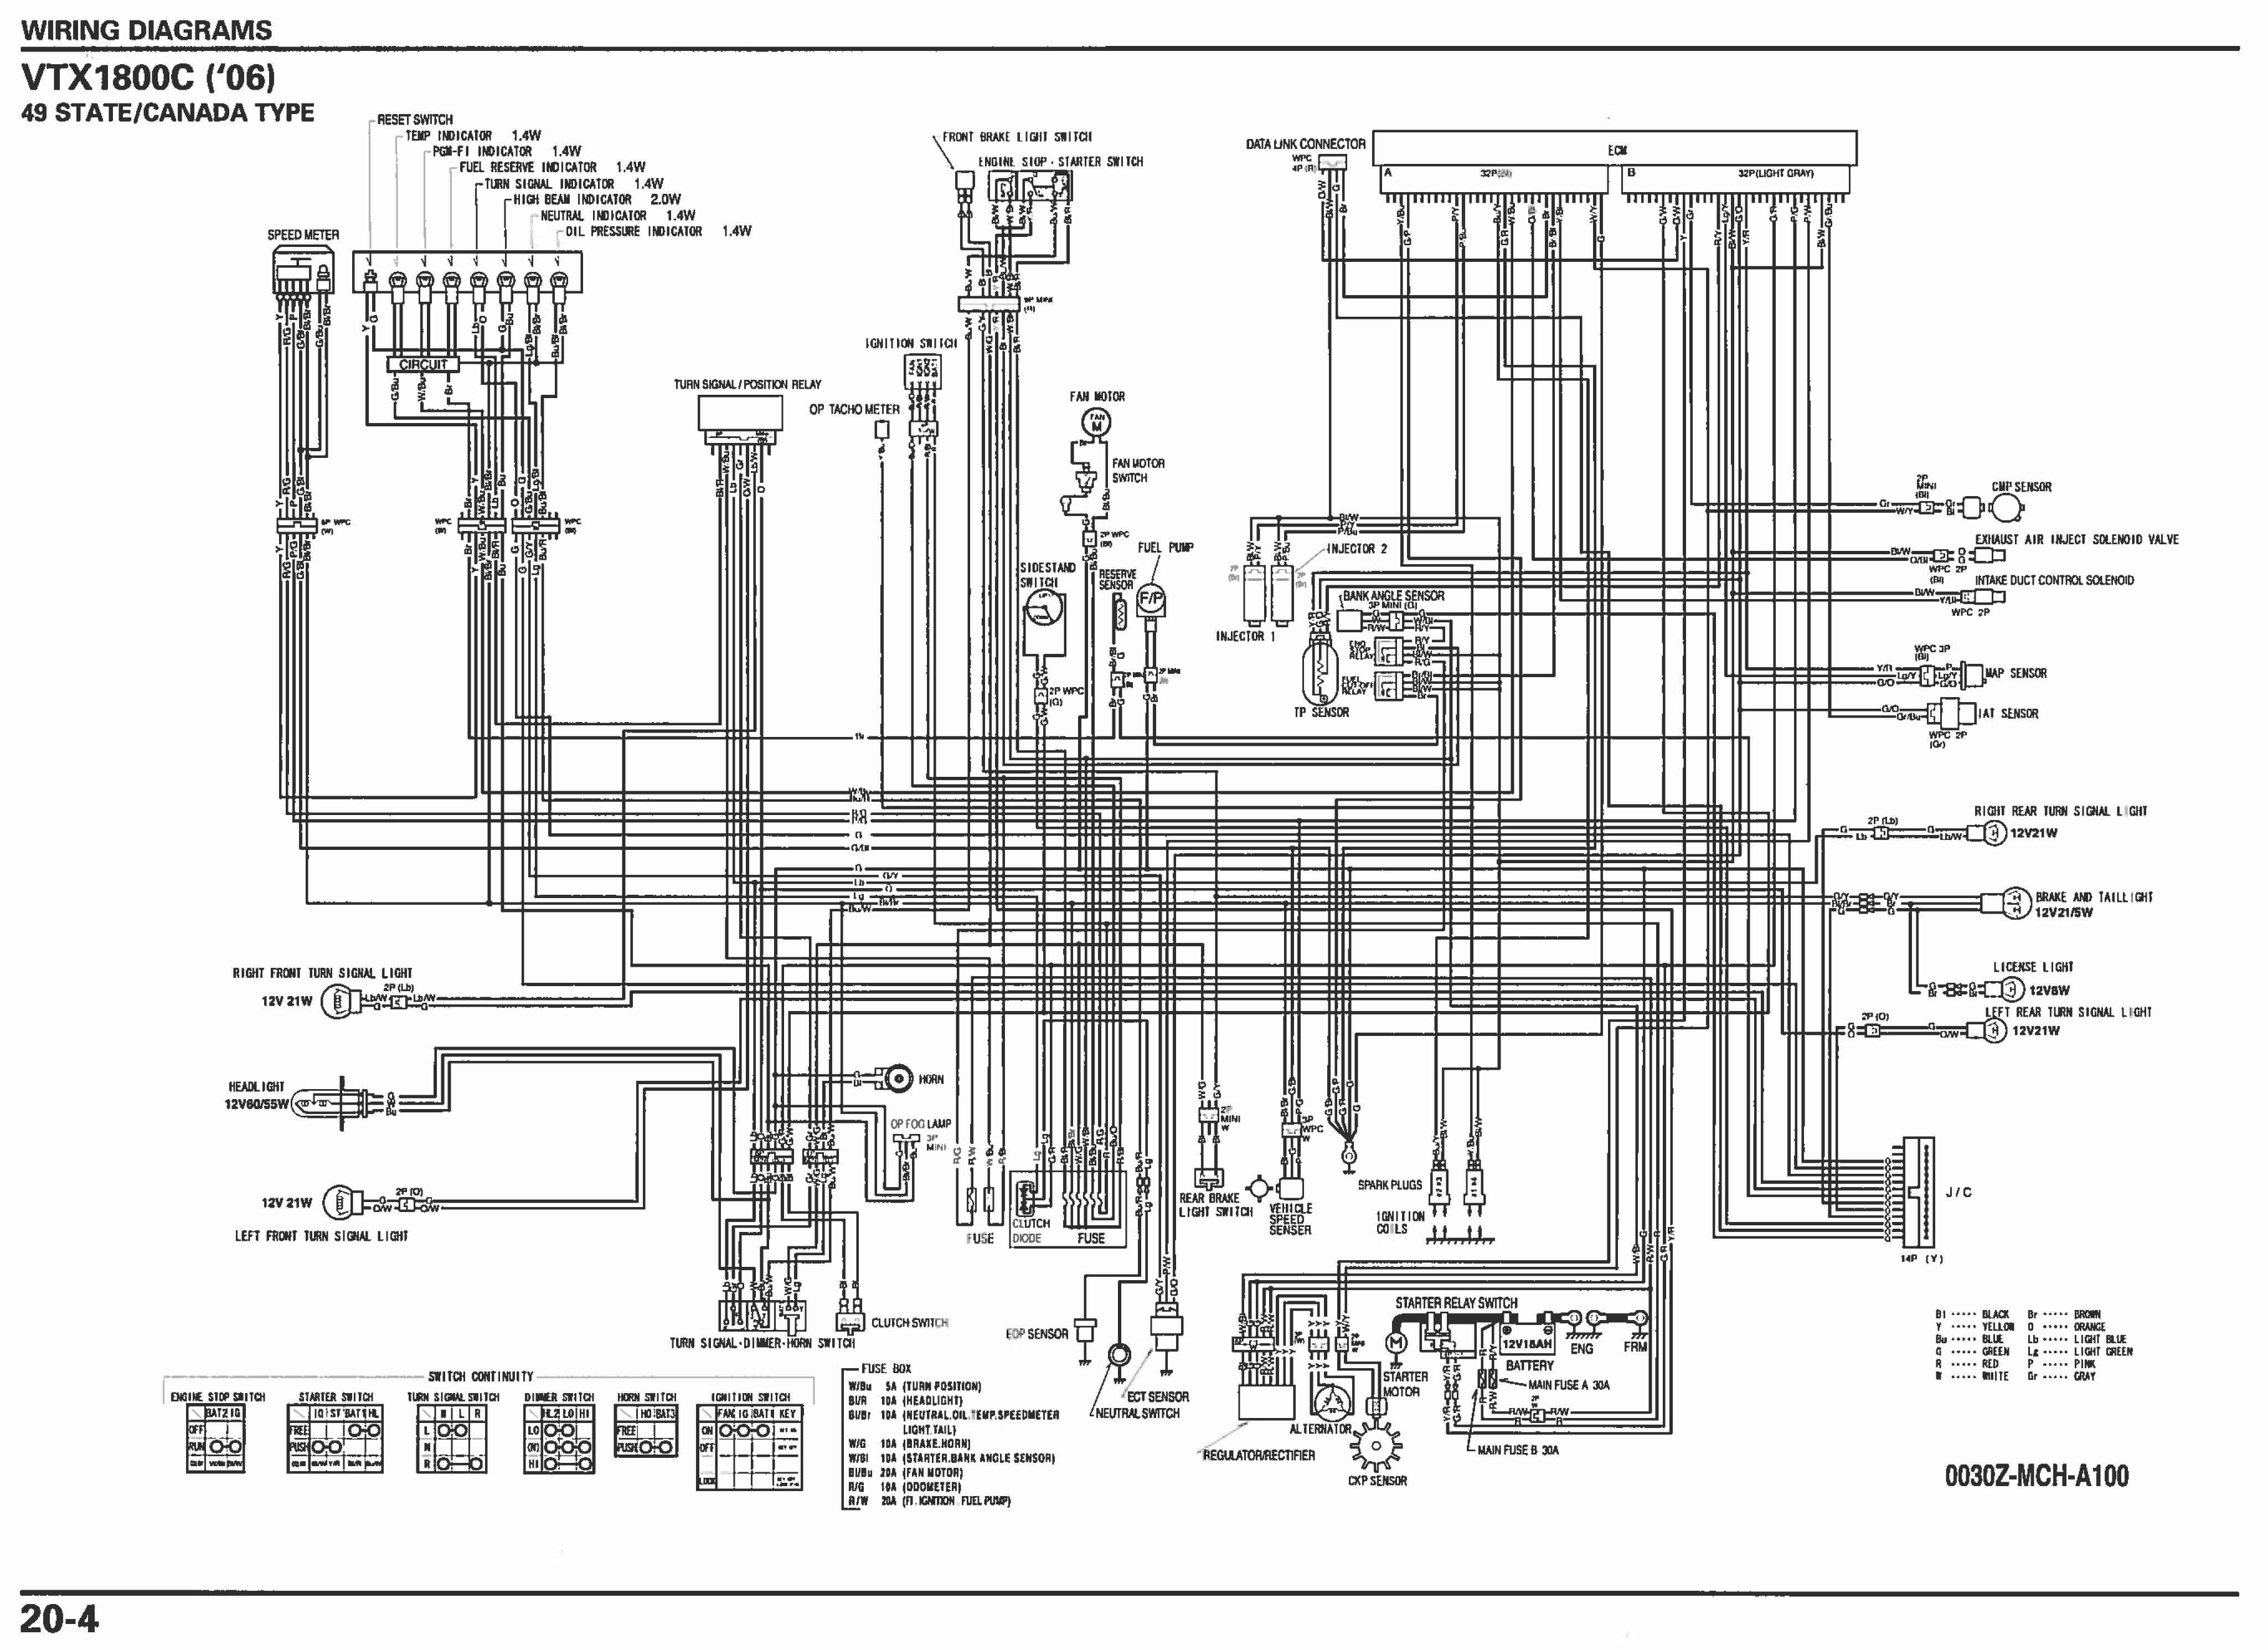 DIAGRAM] Volkswagen T Roc Wiring Diagram FULL Version HD Quality Wiring  Diagram - DIAGRAMAFOUNDATION.TOUSLESMEMES.FRdiagramafoundation.touslesmemes.fr